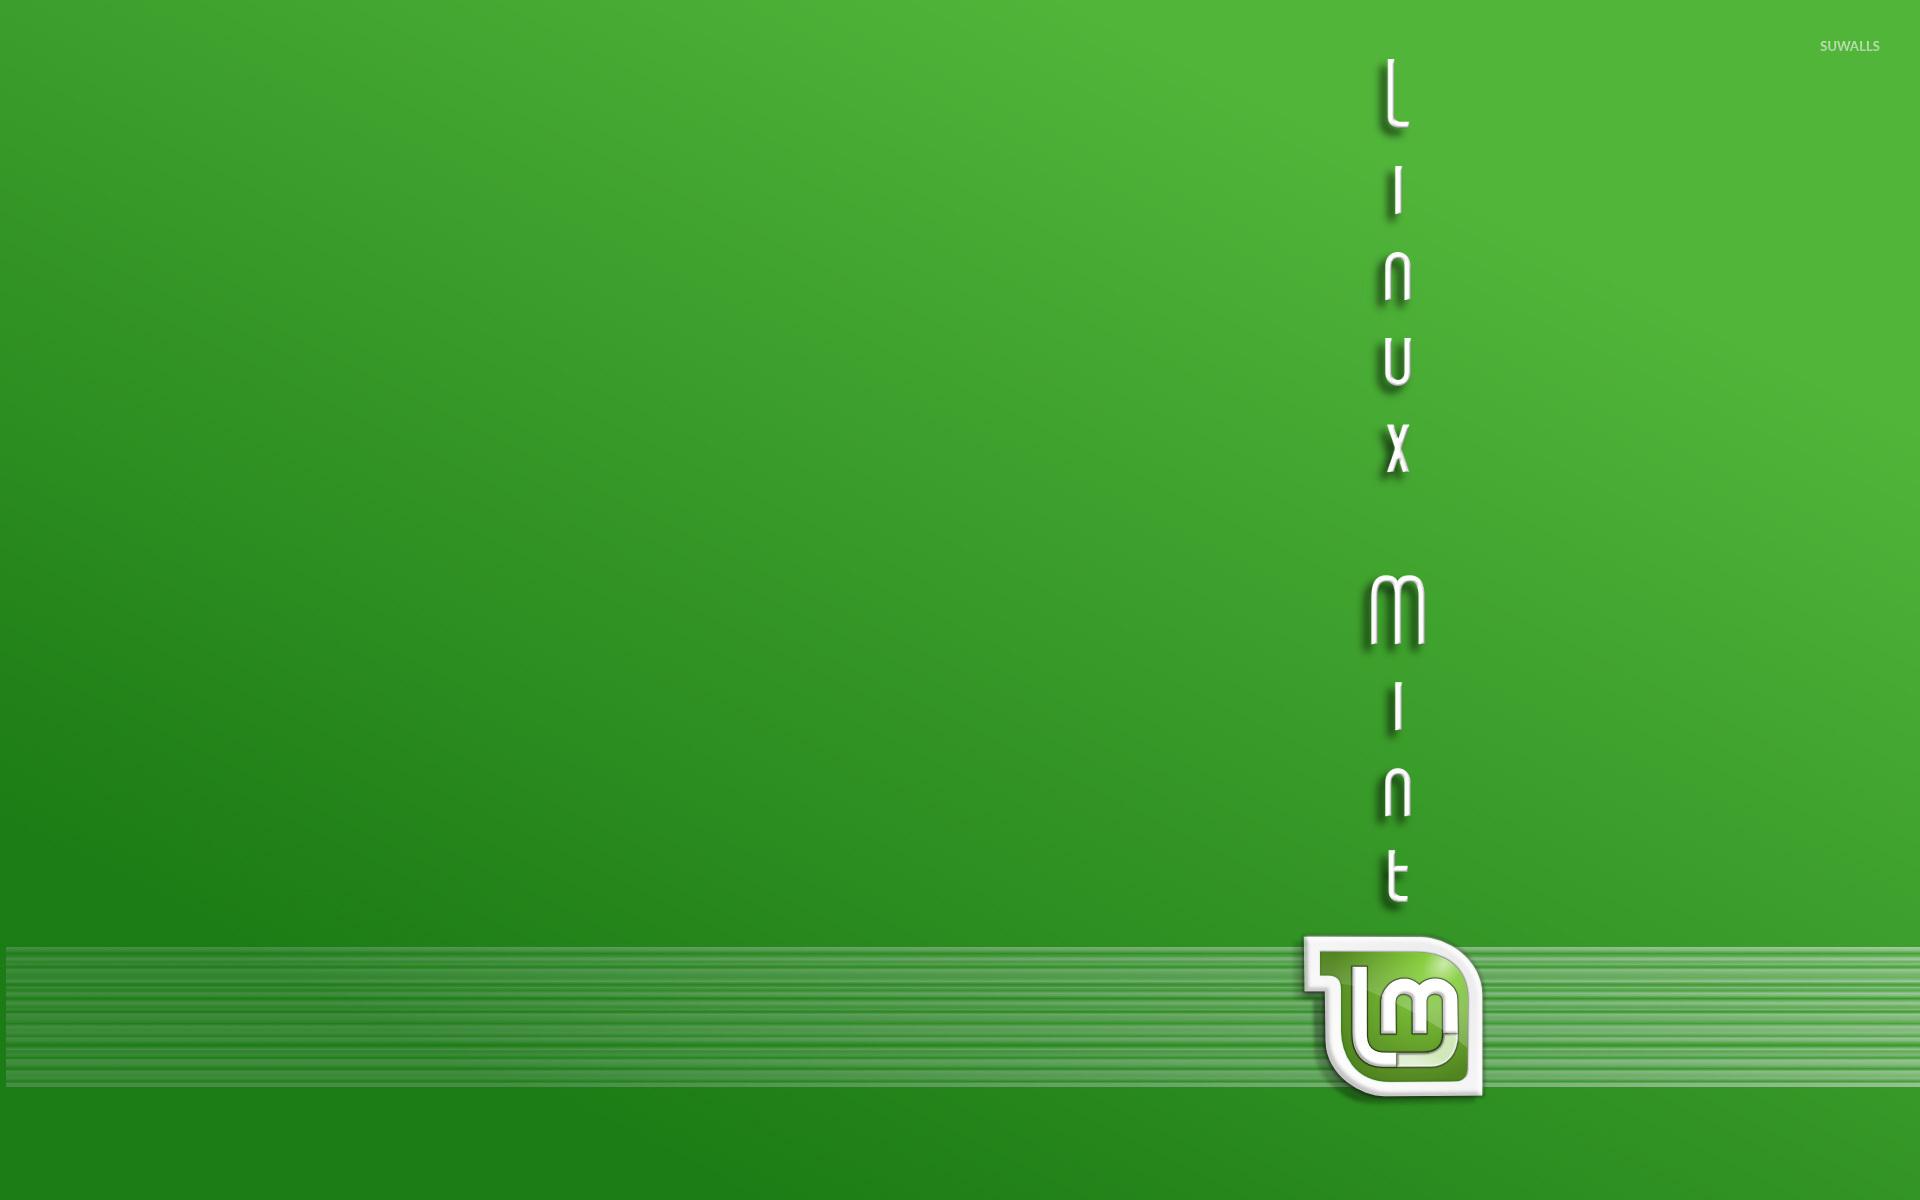 Linux Mint wallpaper   Computer wallpapers   8018 1366x768